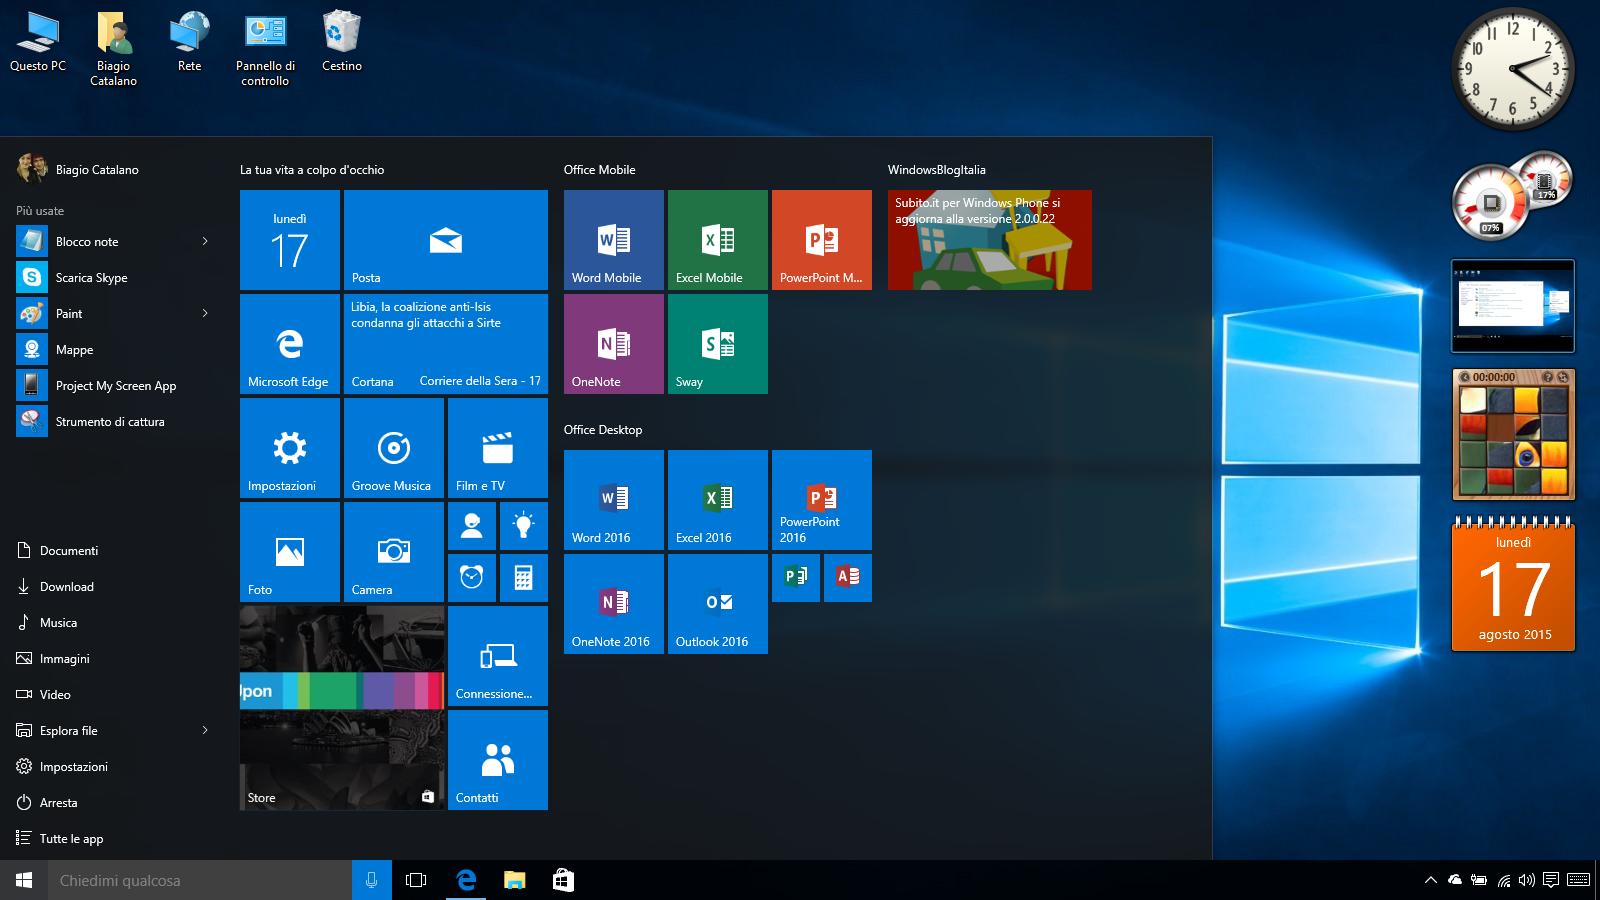 Come avere i Gadget di Windows 7 sul Desktop di Windows 10 | WindowsBlogItalia